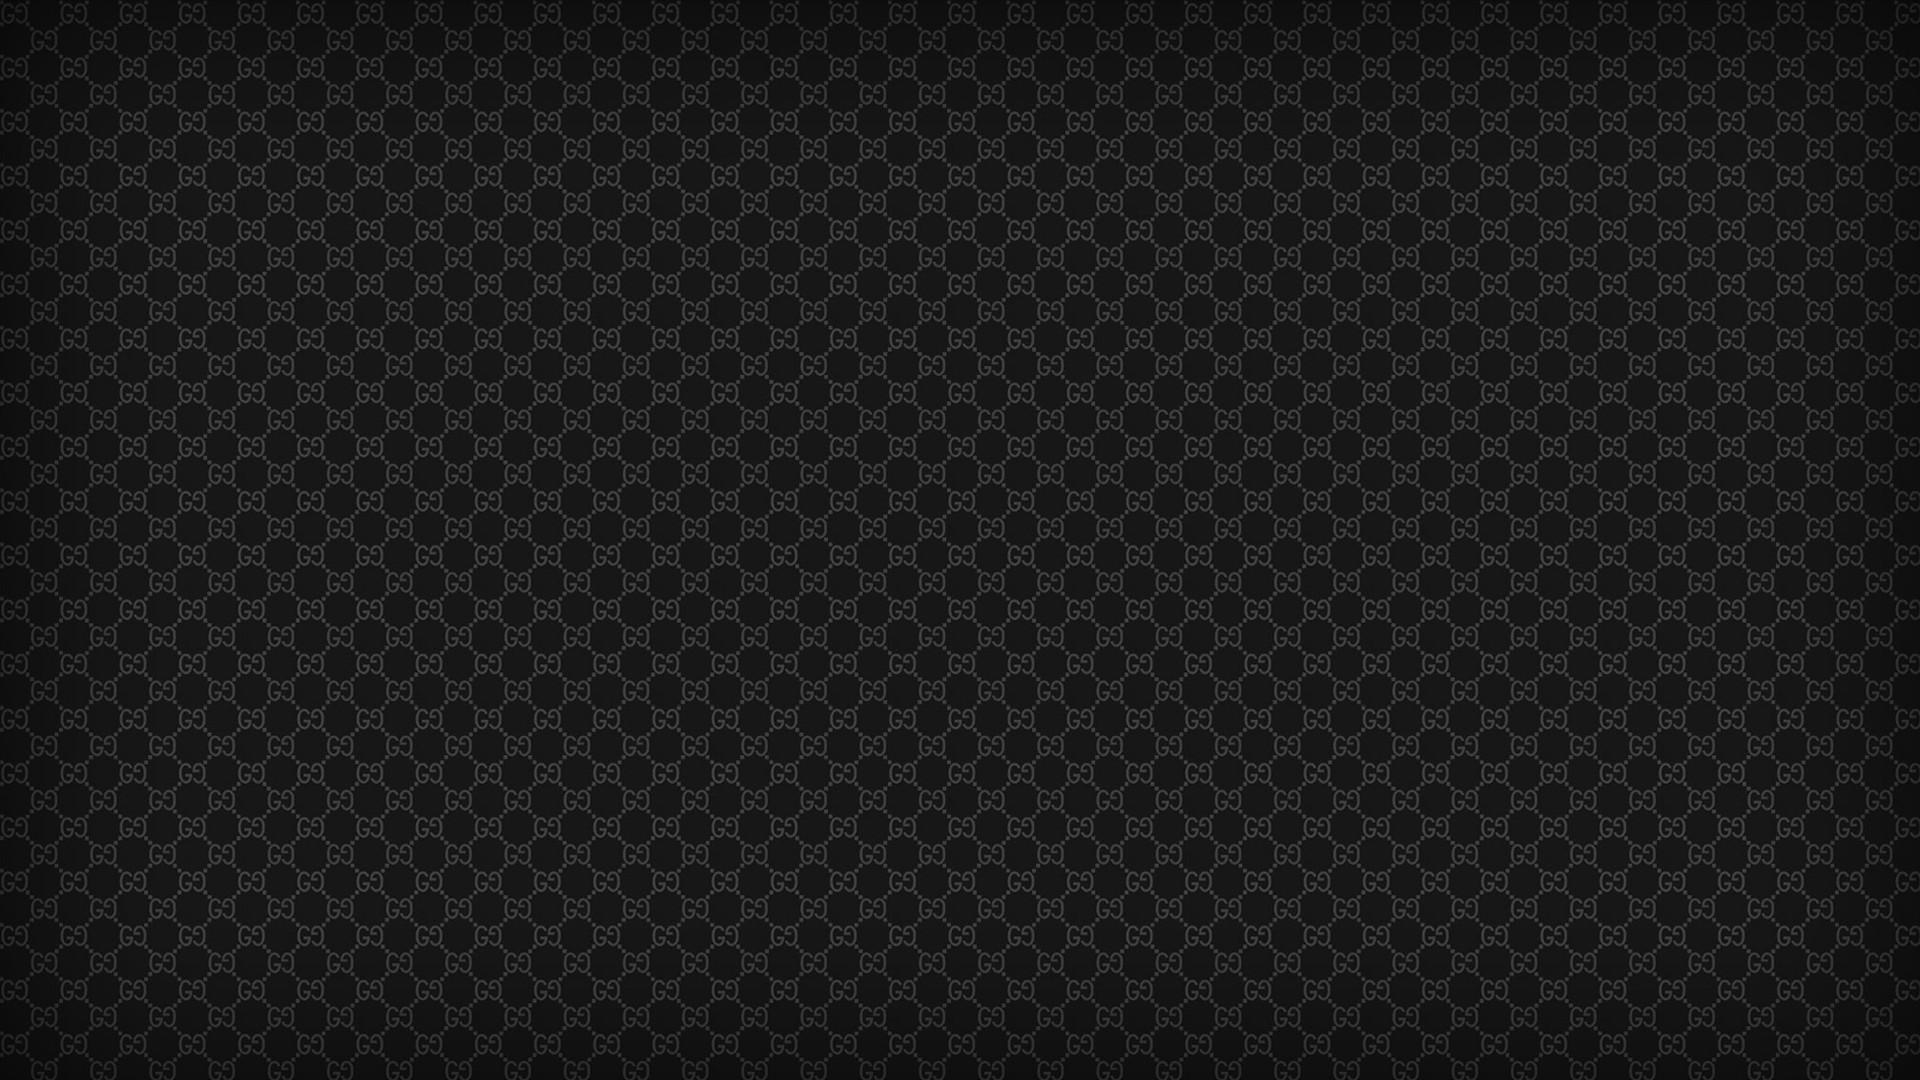 Black Patterns Textures Gucci Designer Label Wallpaper